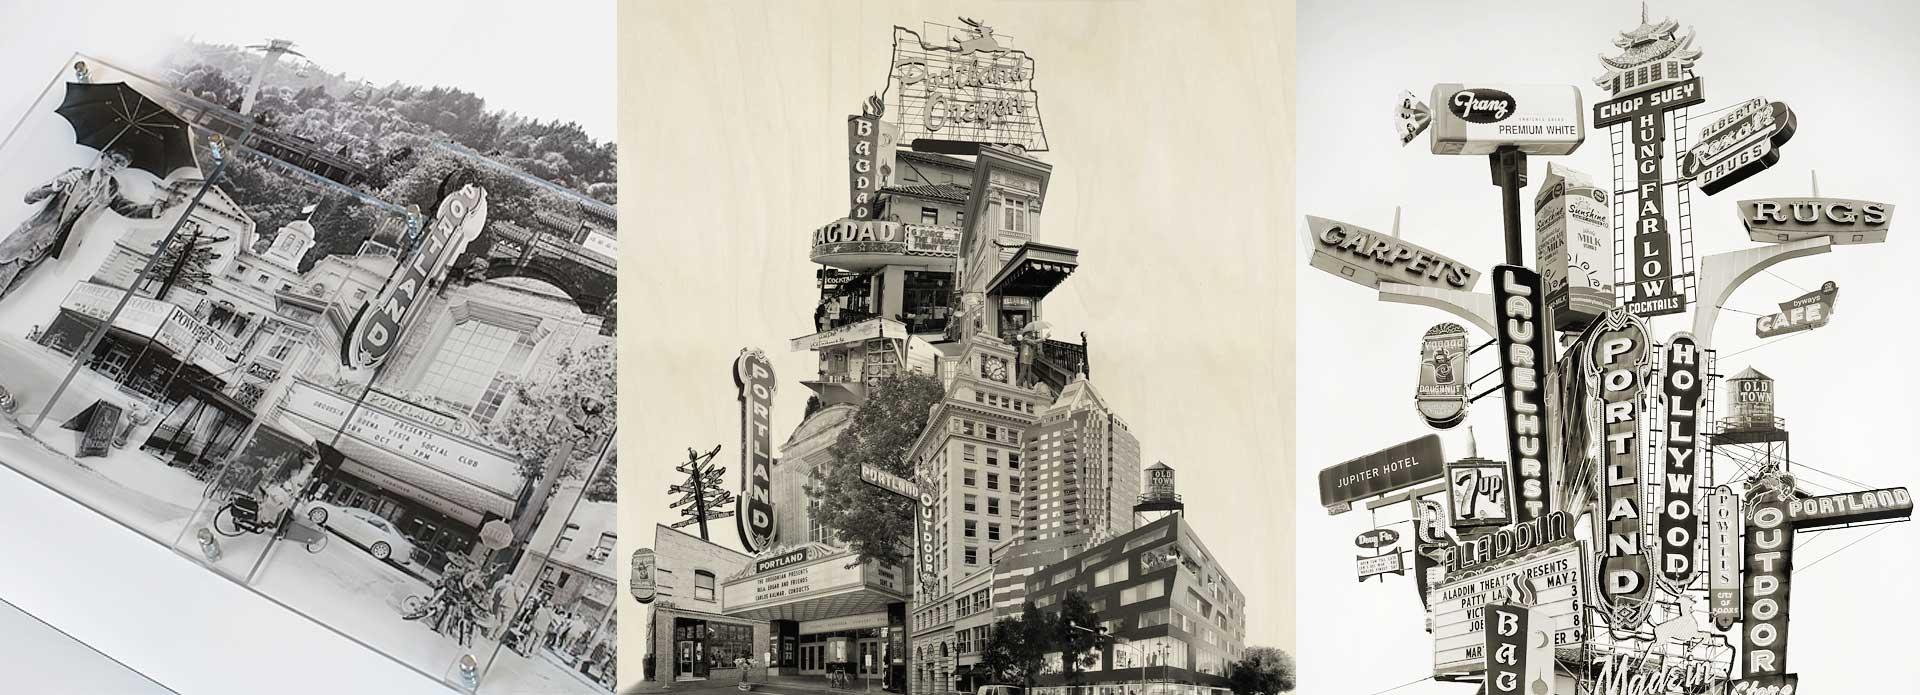 Cityscape Artwork Photomontage